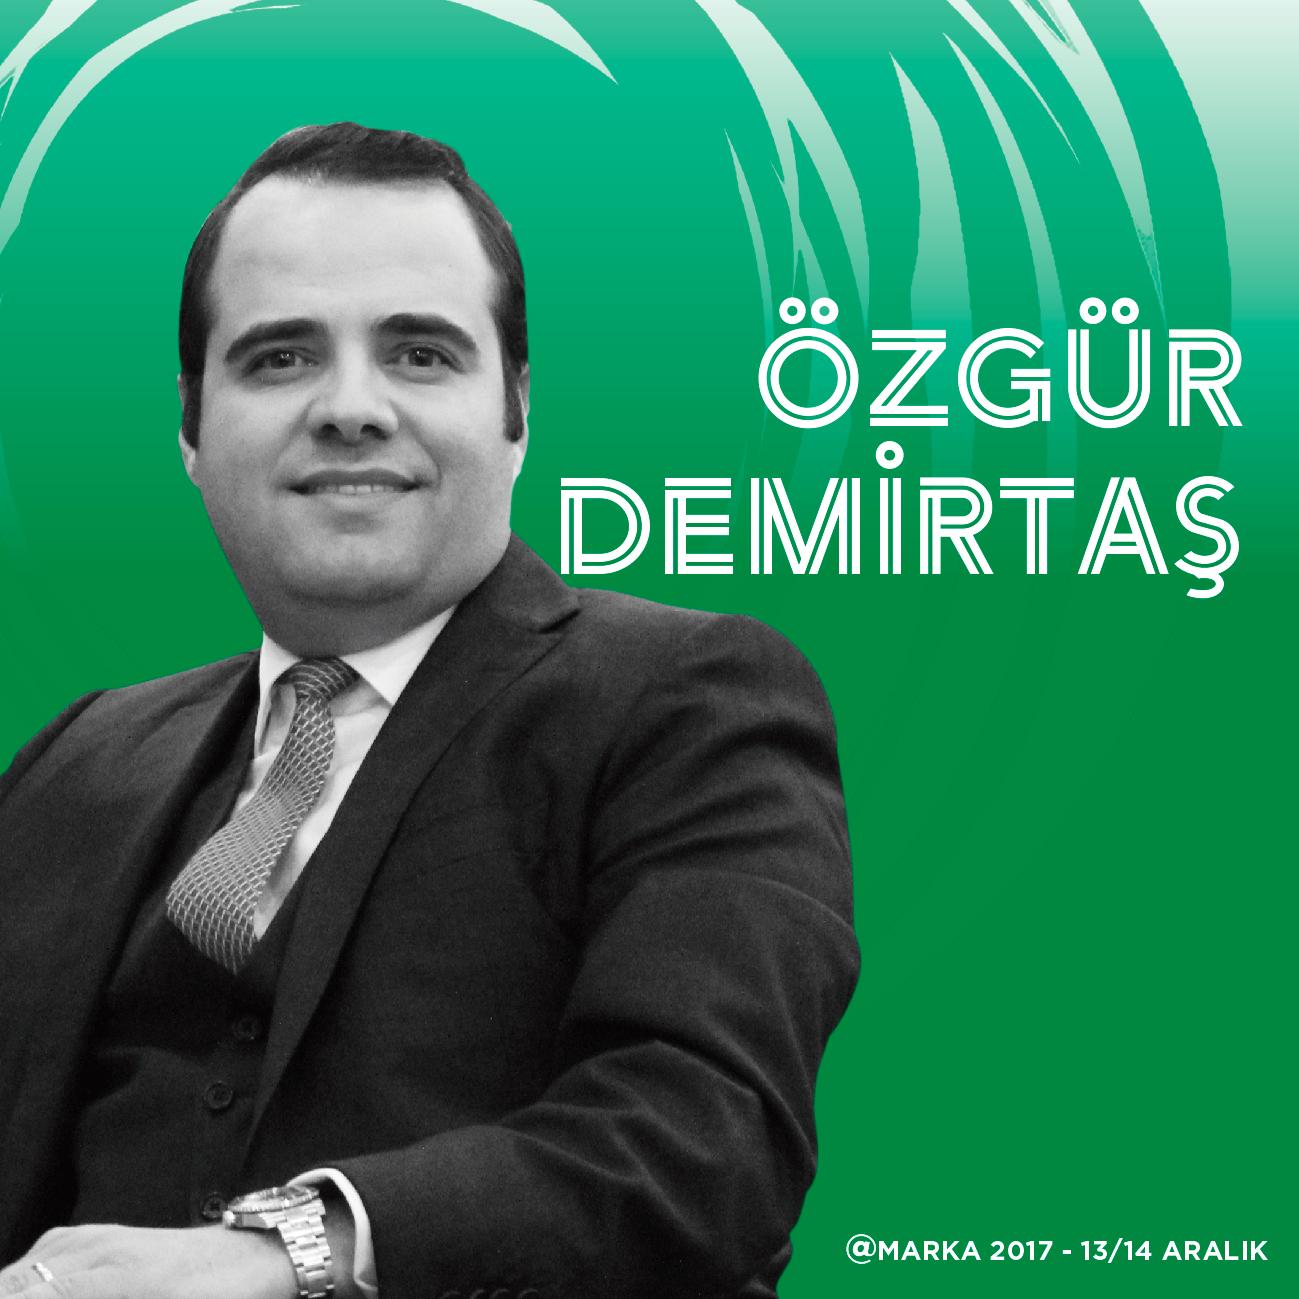 OZGUR DEMIRTAS